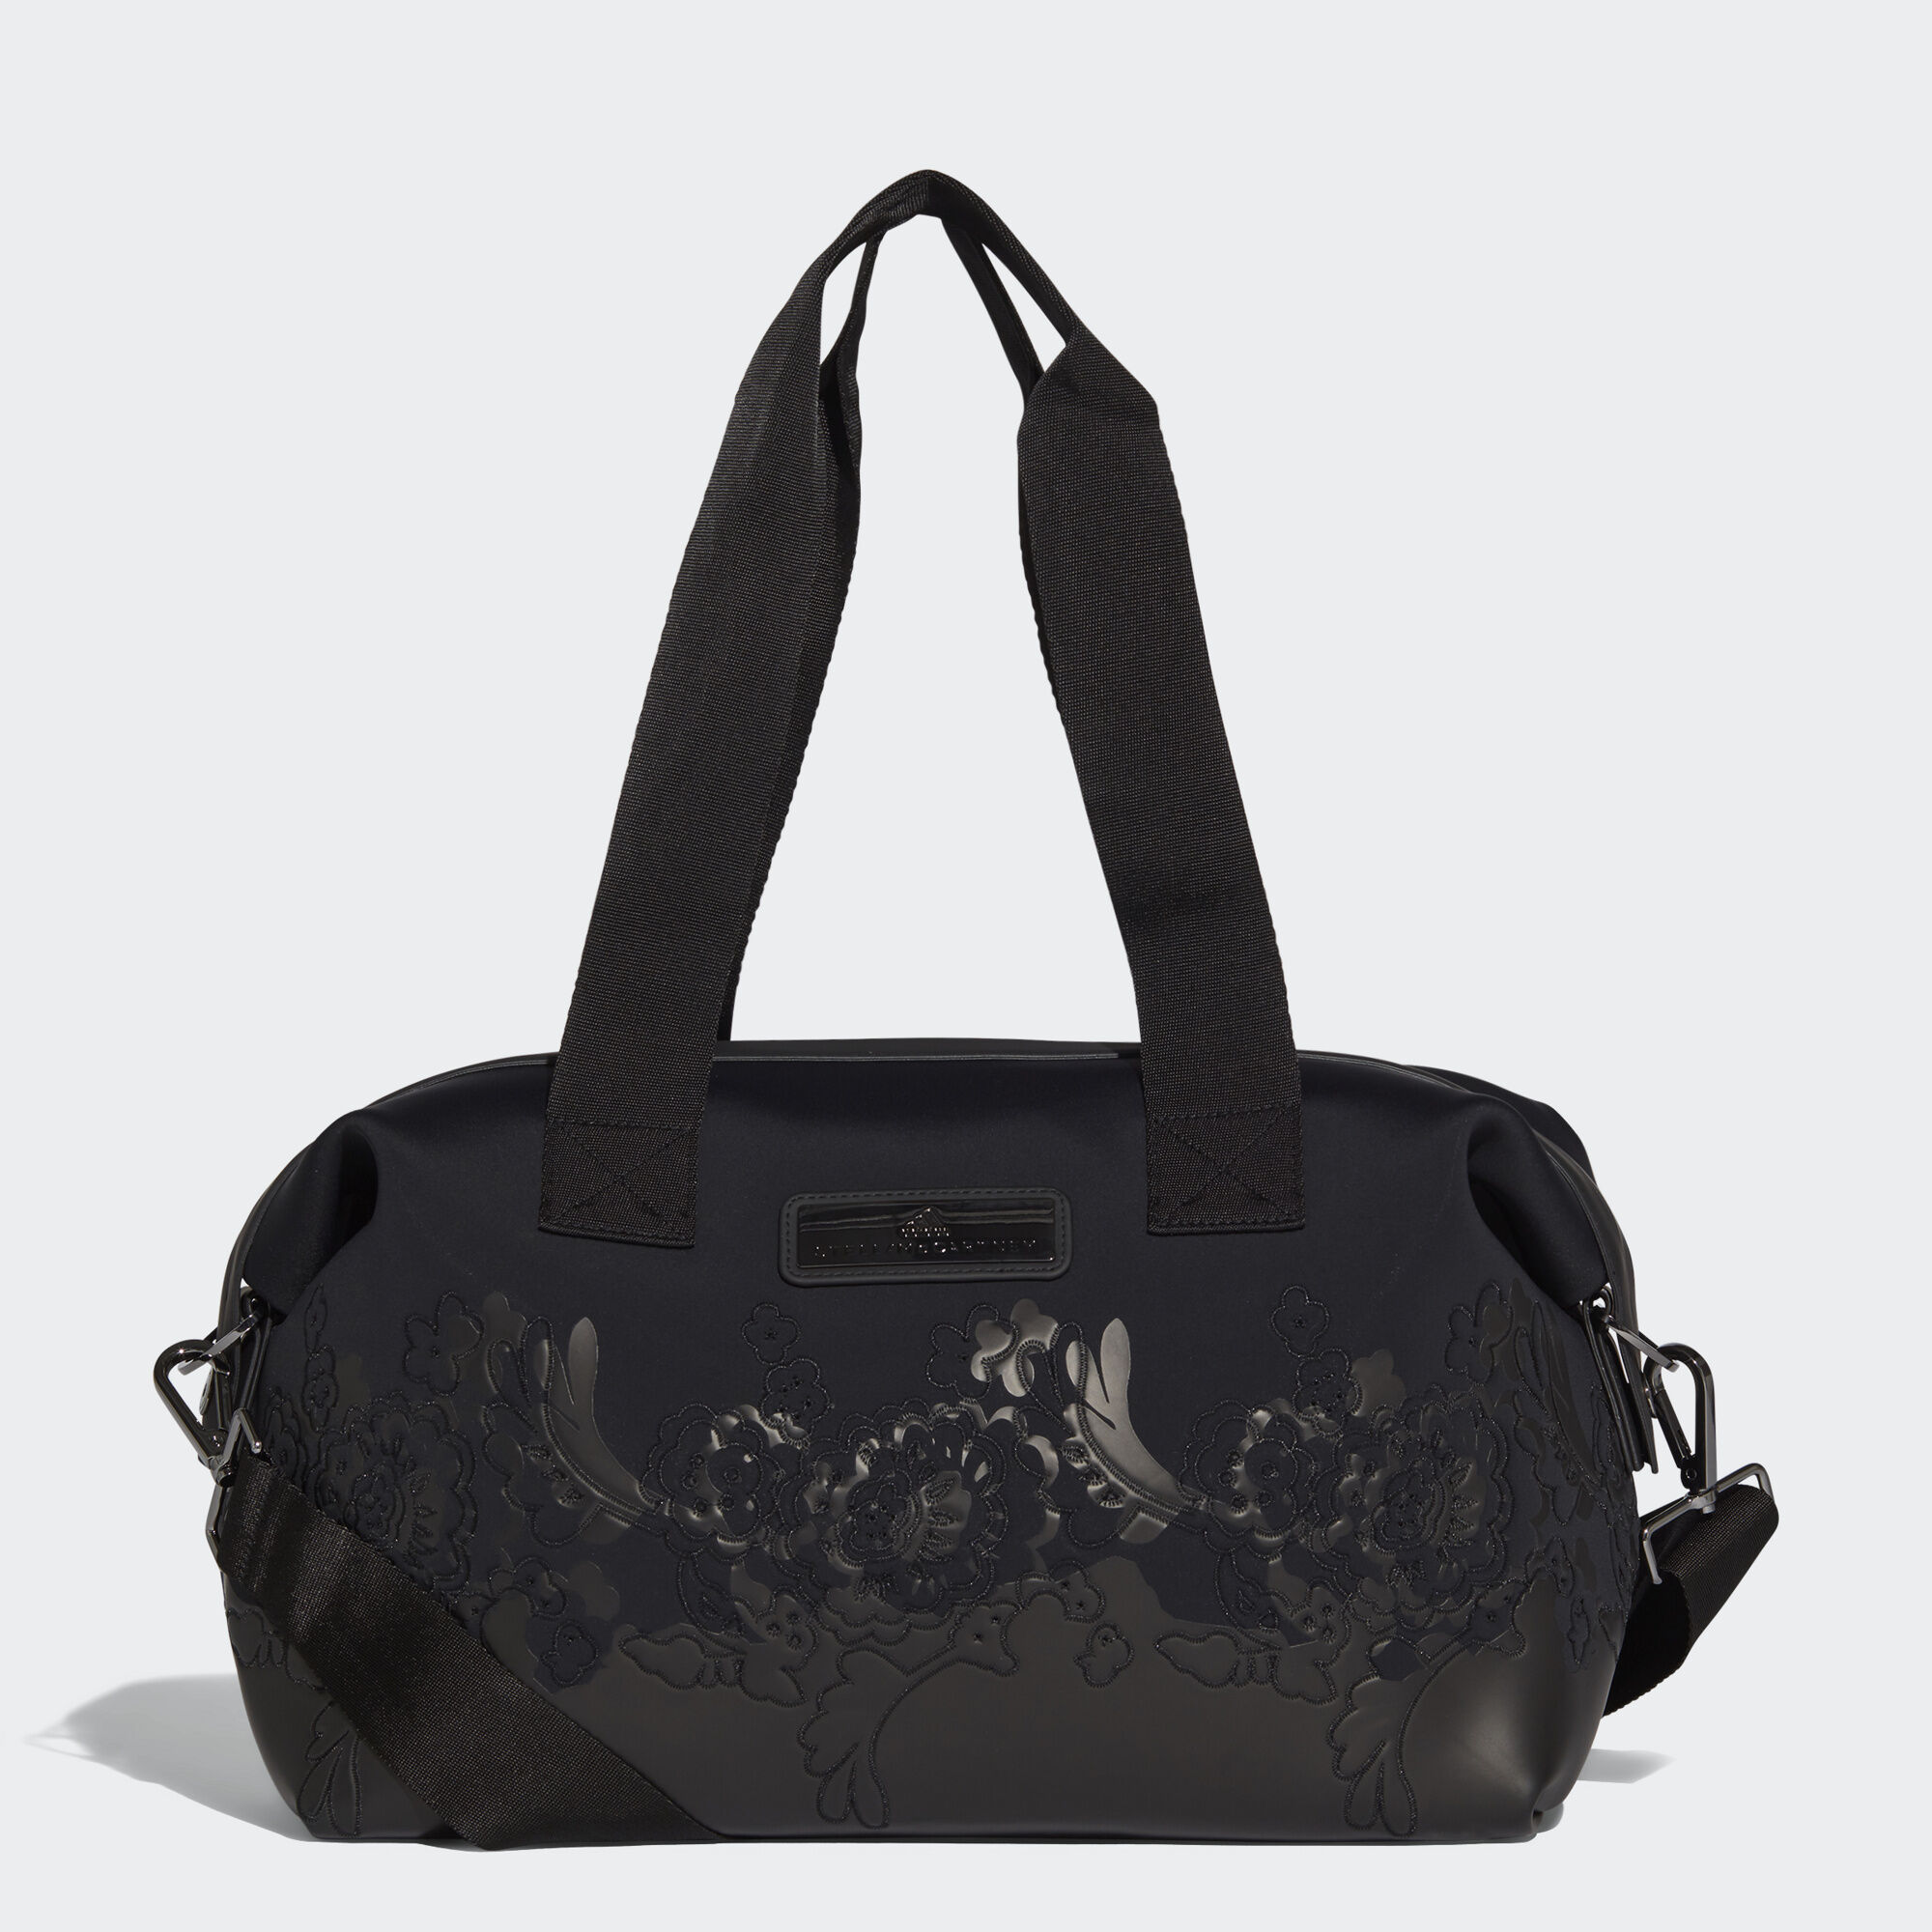 сумка adidas by stella mccartney купить